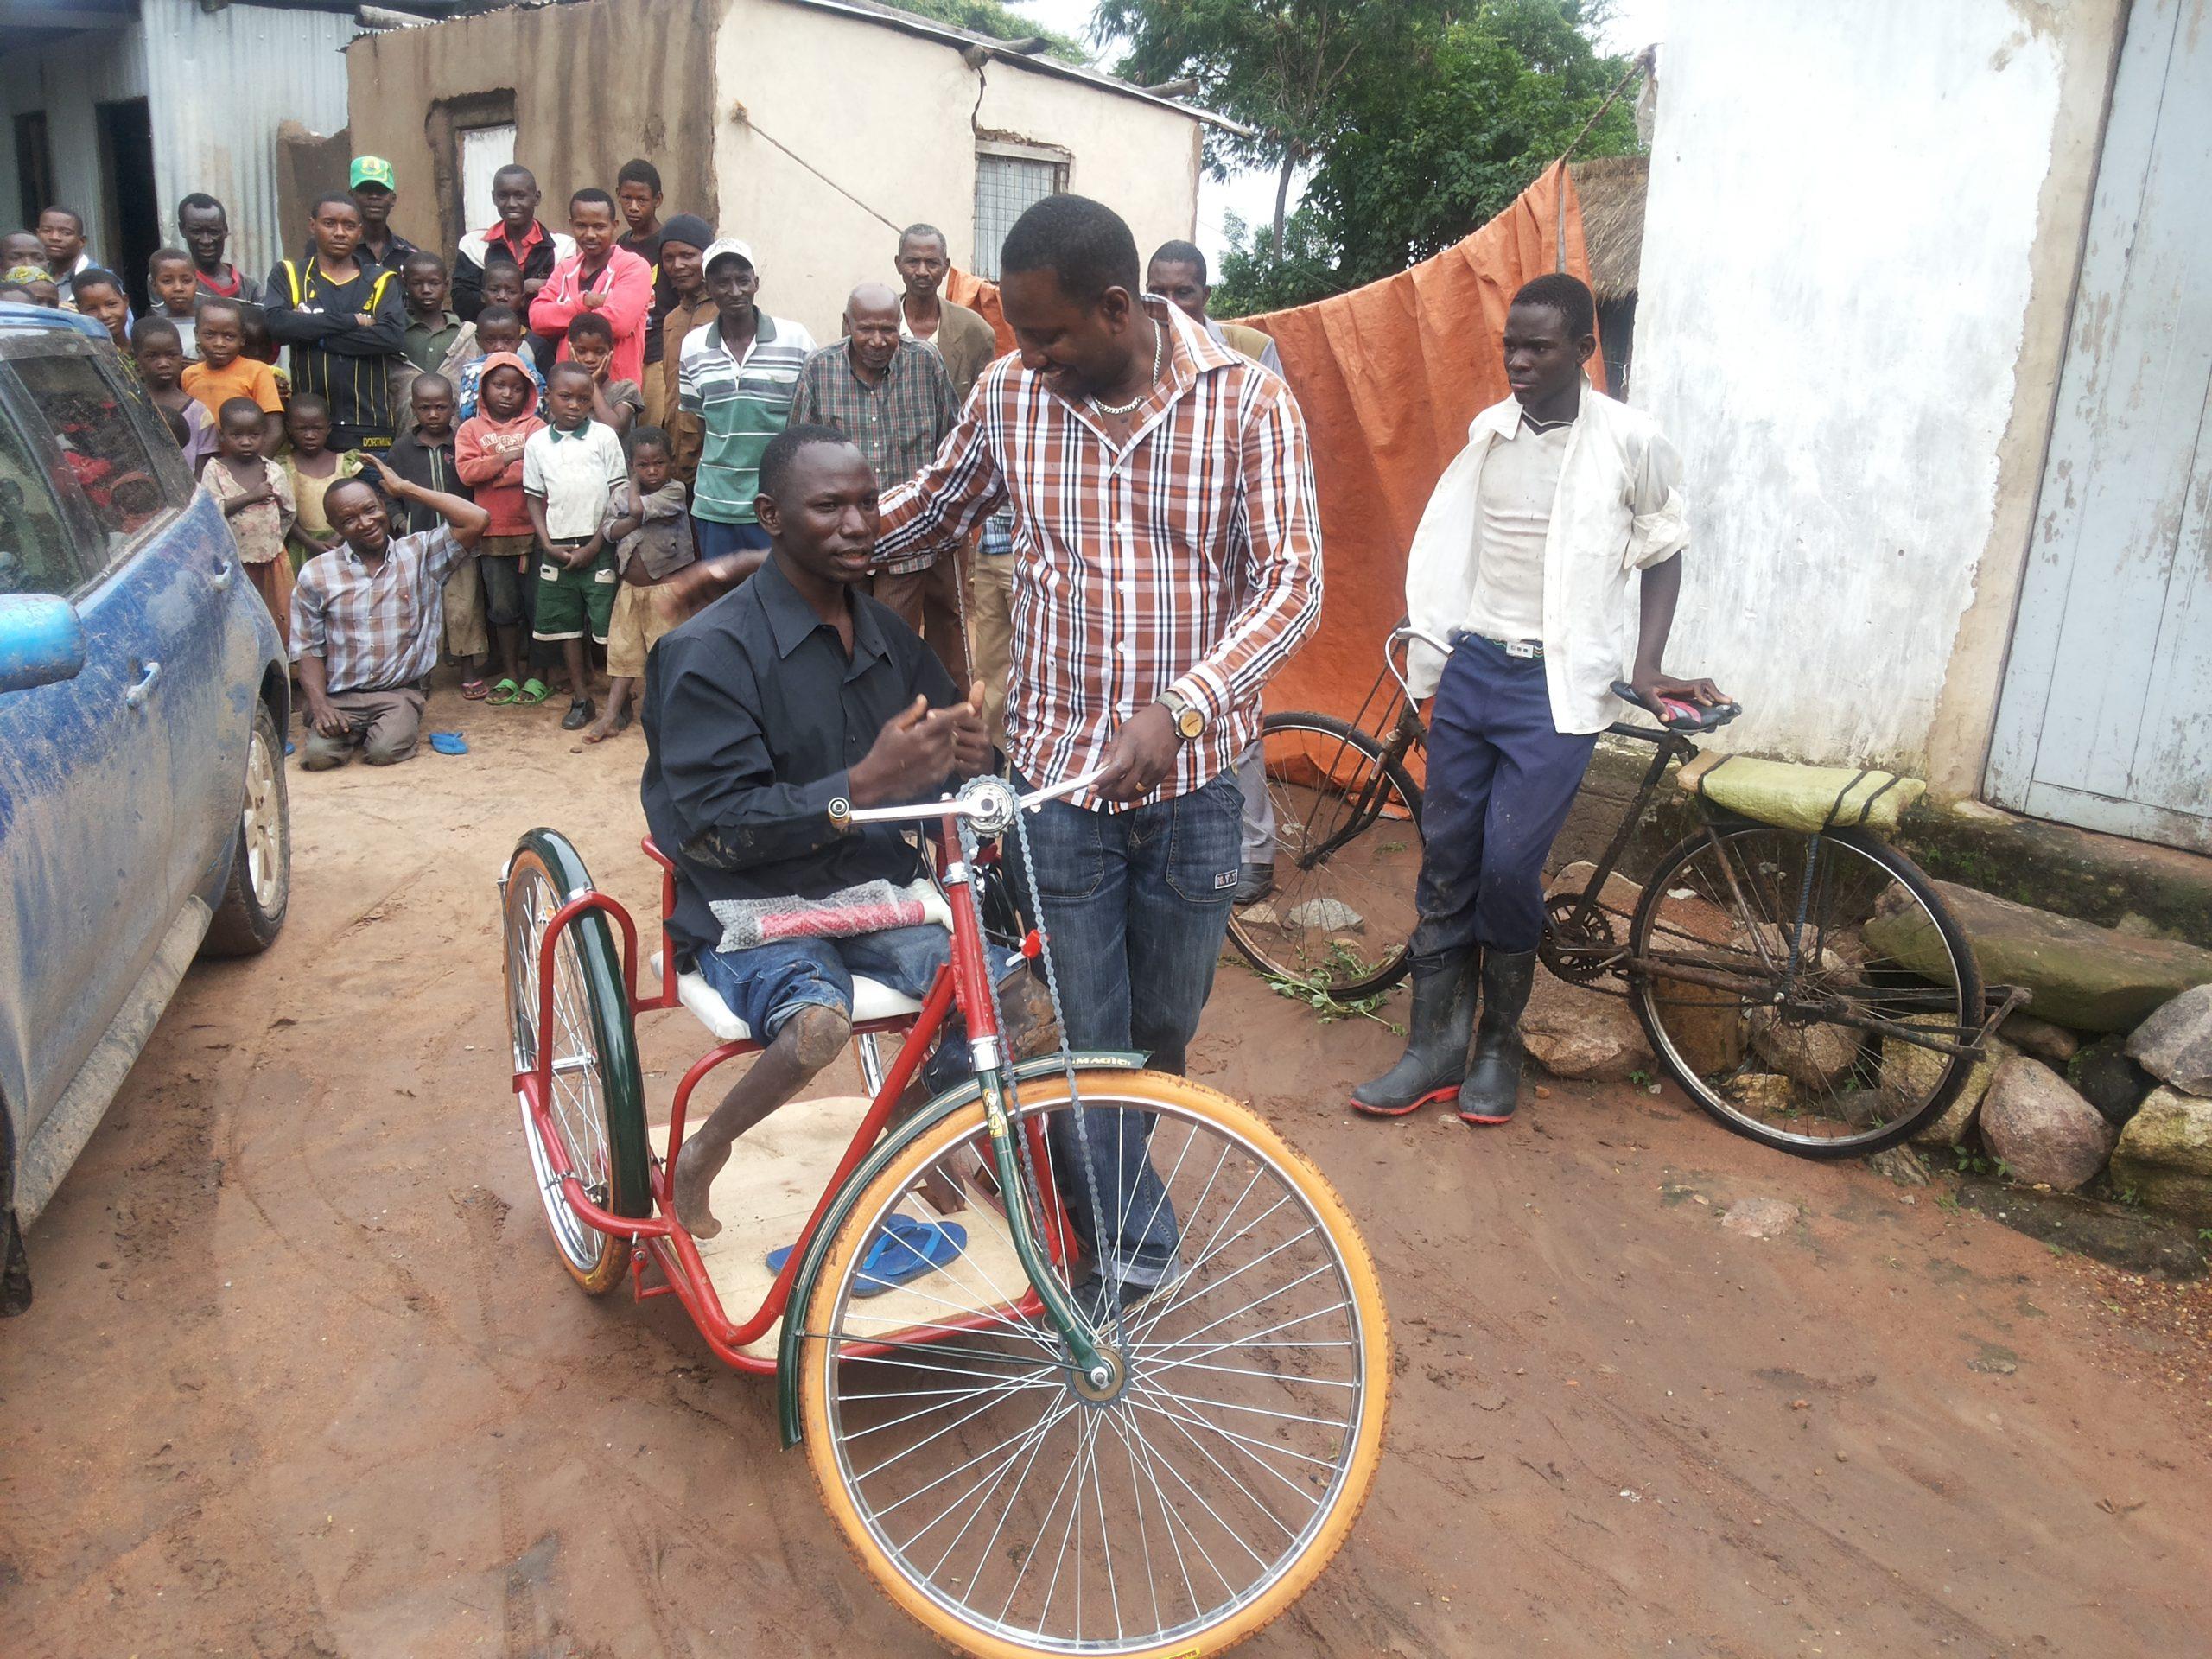 The Tanzania Wheel Chair Project